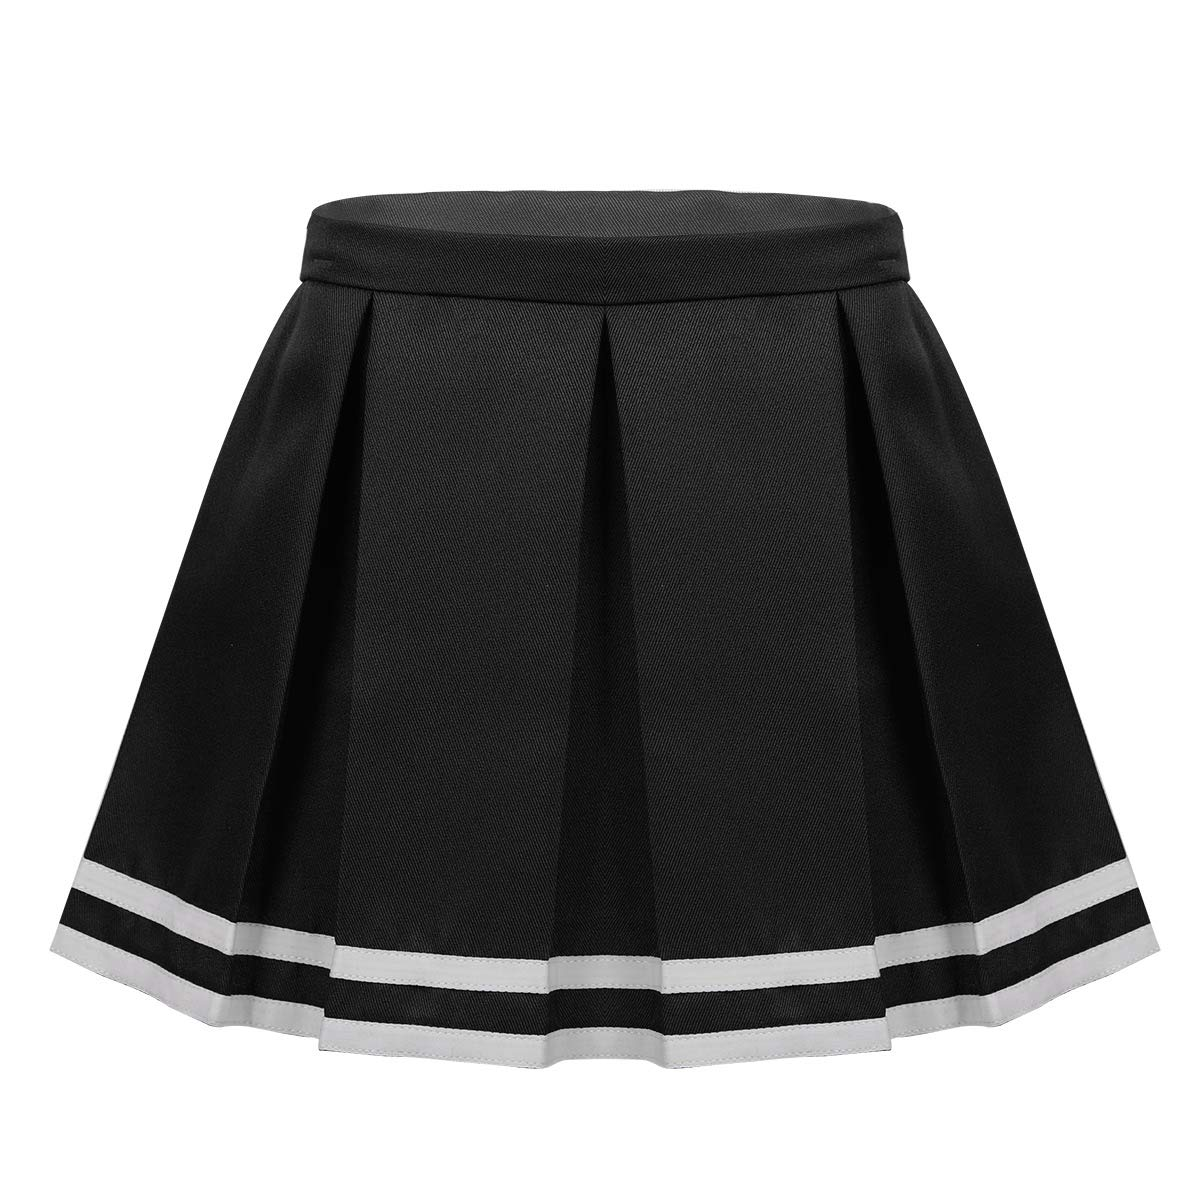 Girls Cheerleader Pleated Skirt Costume A-line Cheer Dancing Uniform Fancy Dress